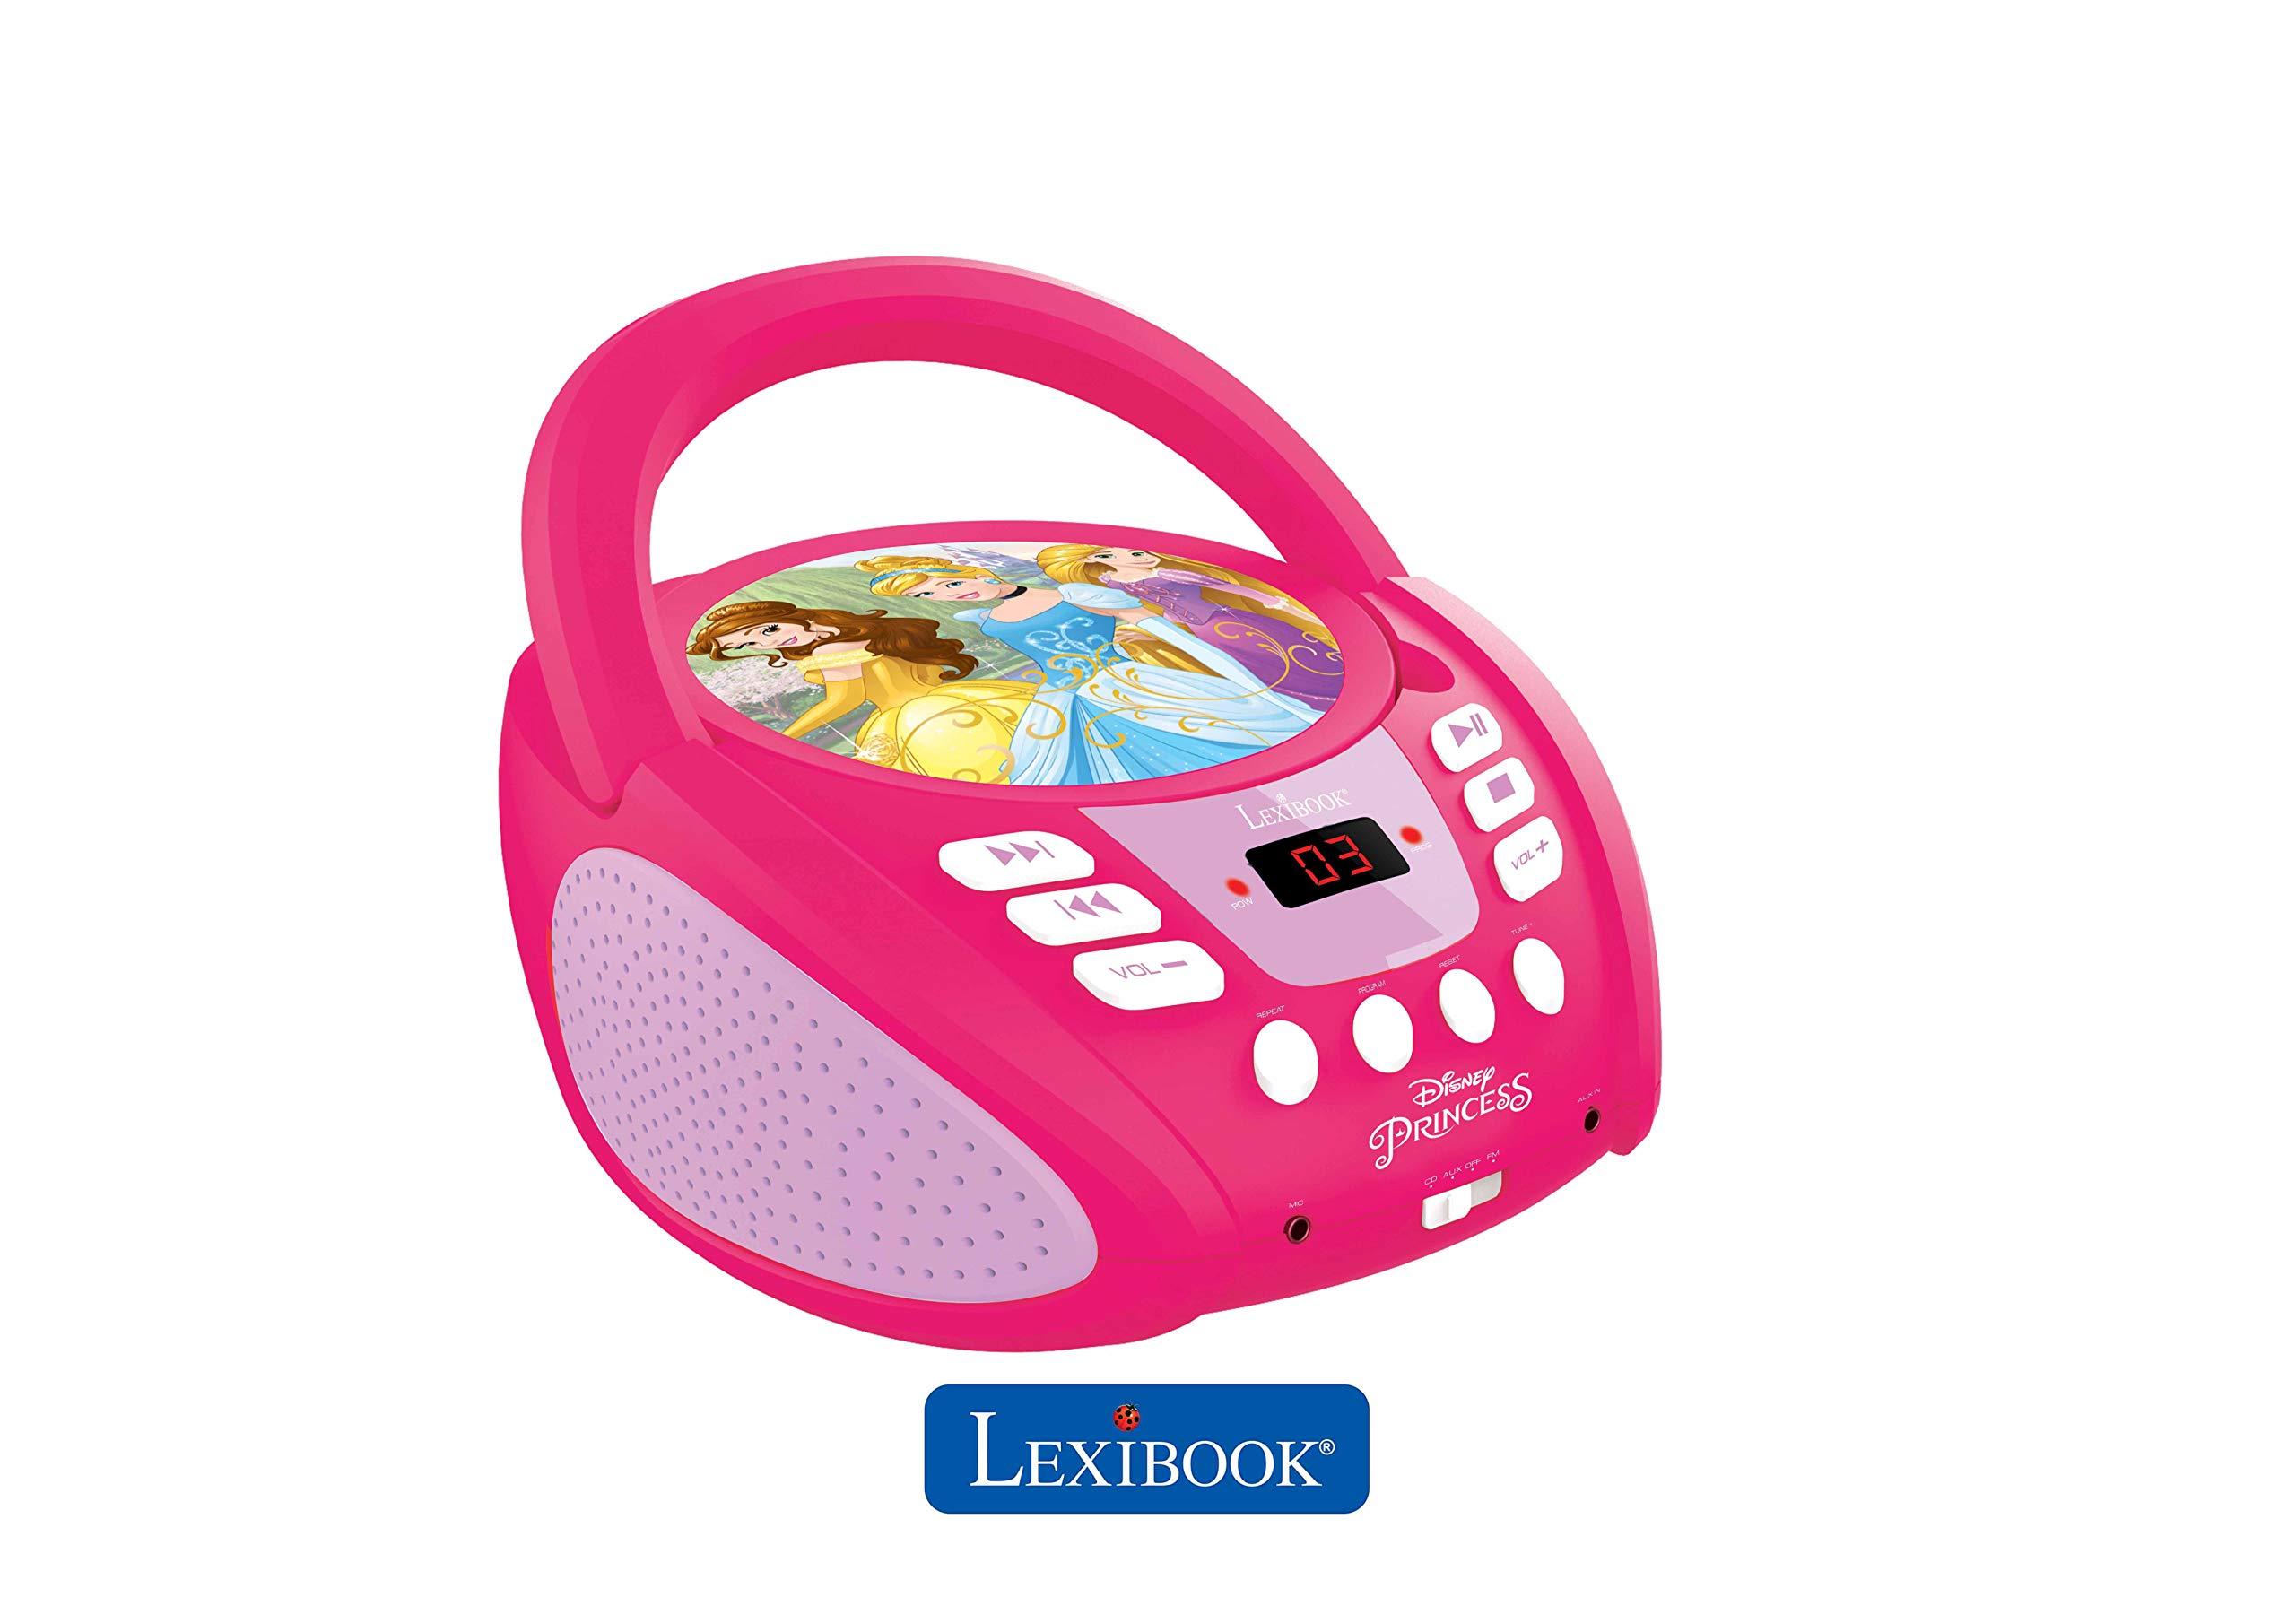 LEXiBOOK Disney Princess Boombox Radio CD Player by LEXiBOOK (Image #4)